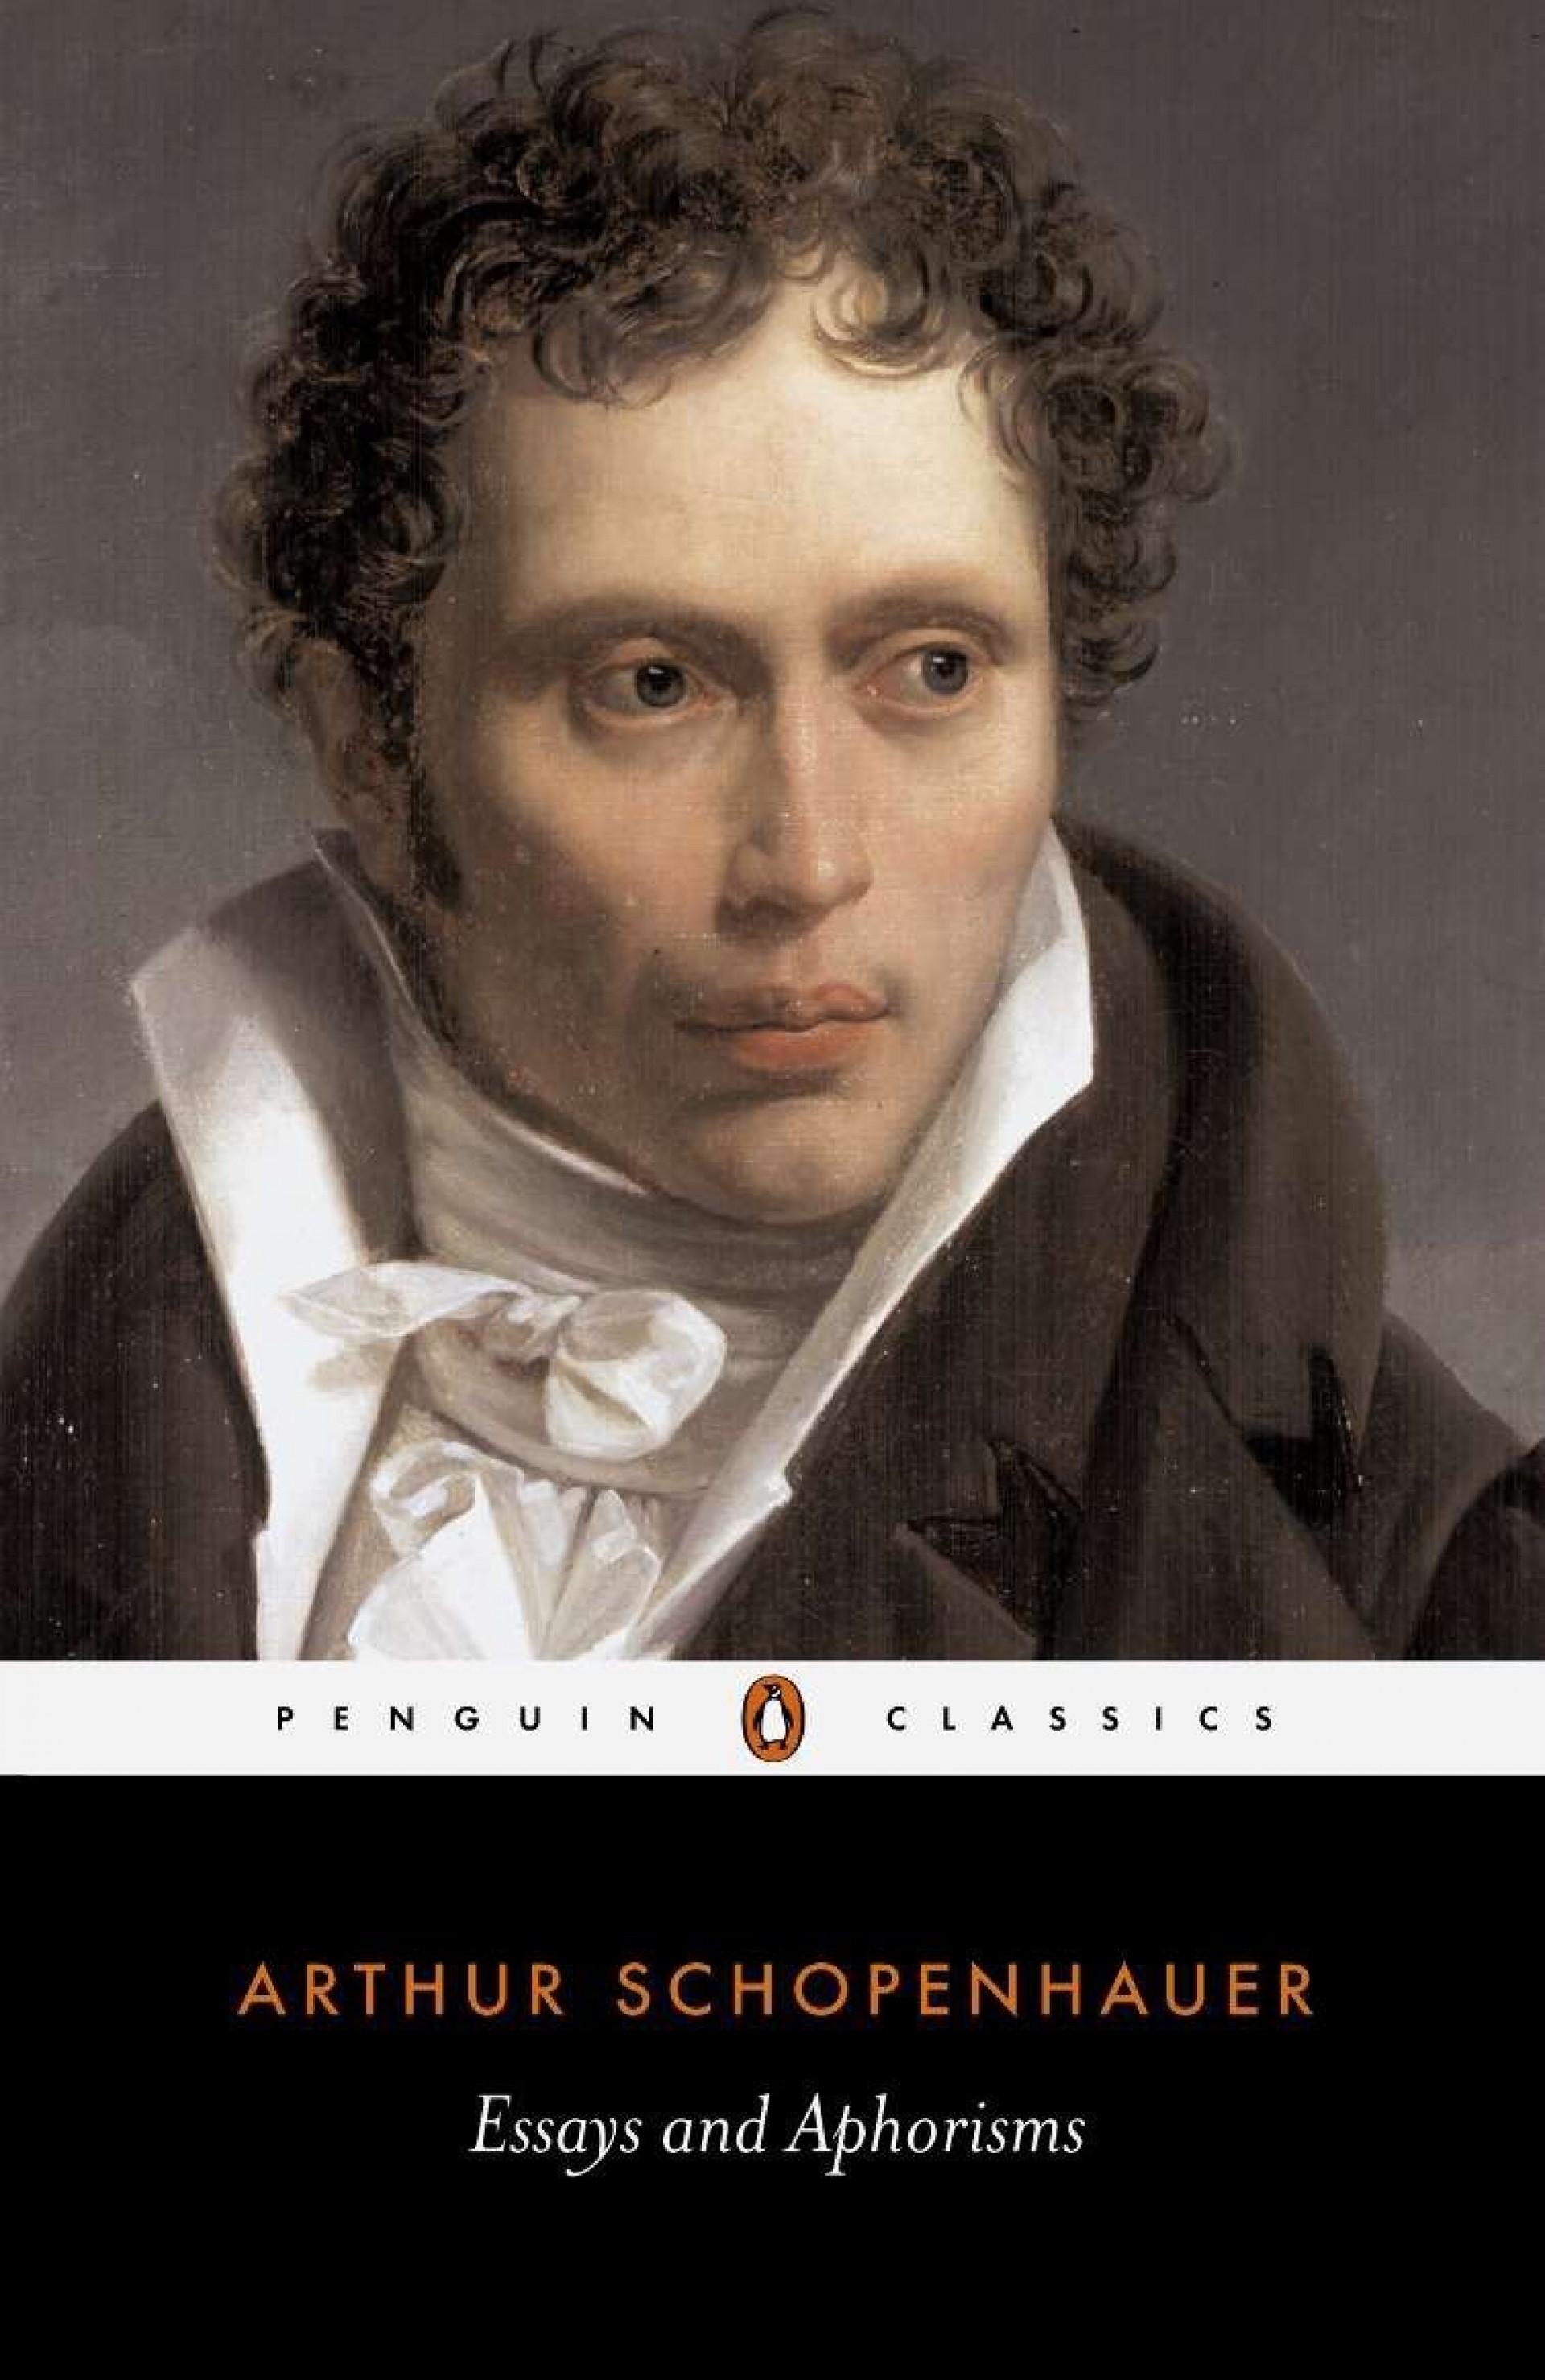 001 Essay Example 61iwcxsw0tl Essays And Frightening Aphorisms Pdf Schopenhauer 1920